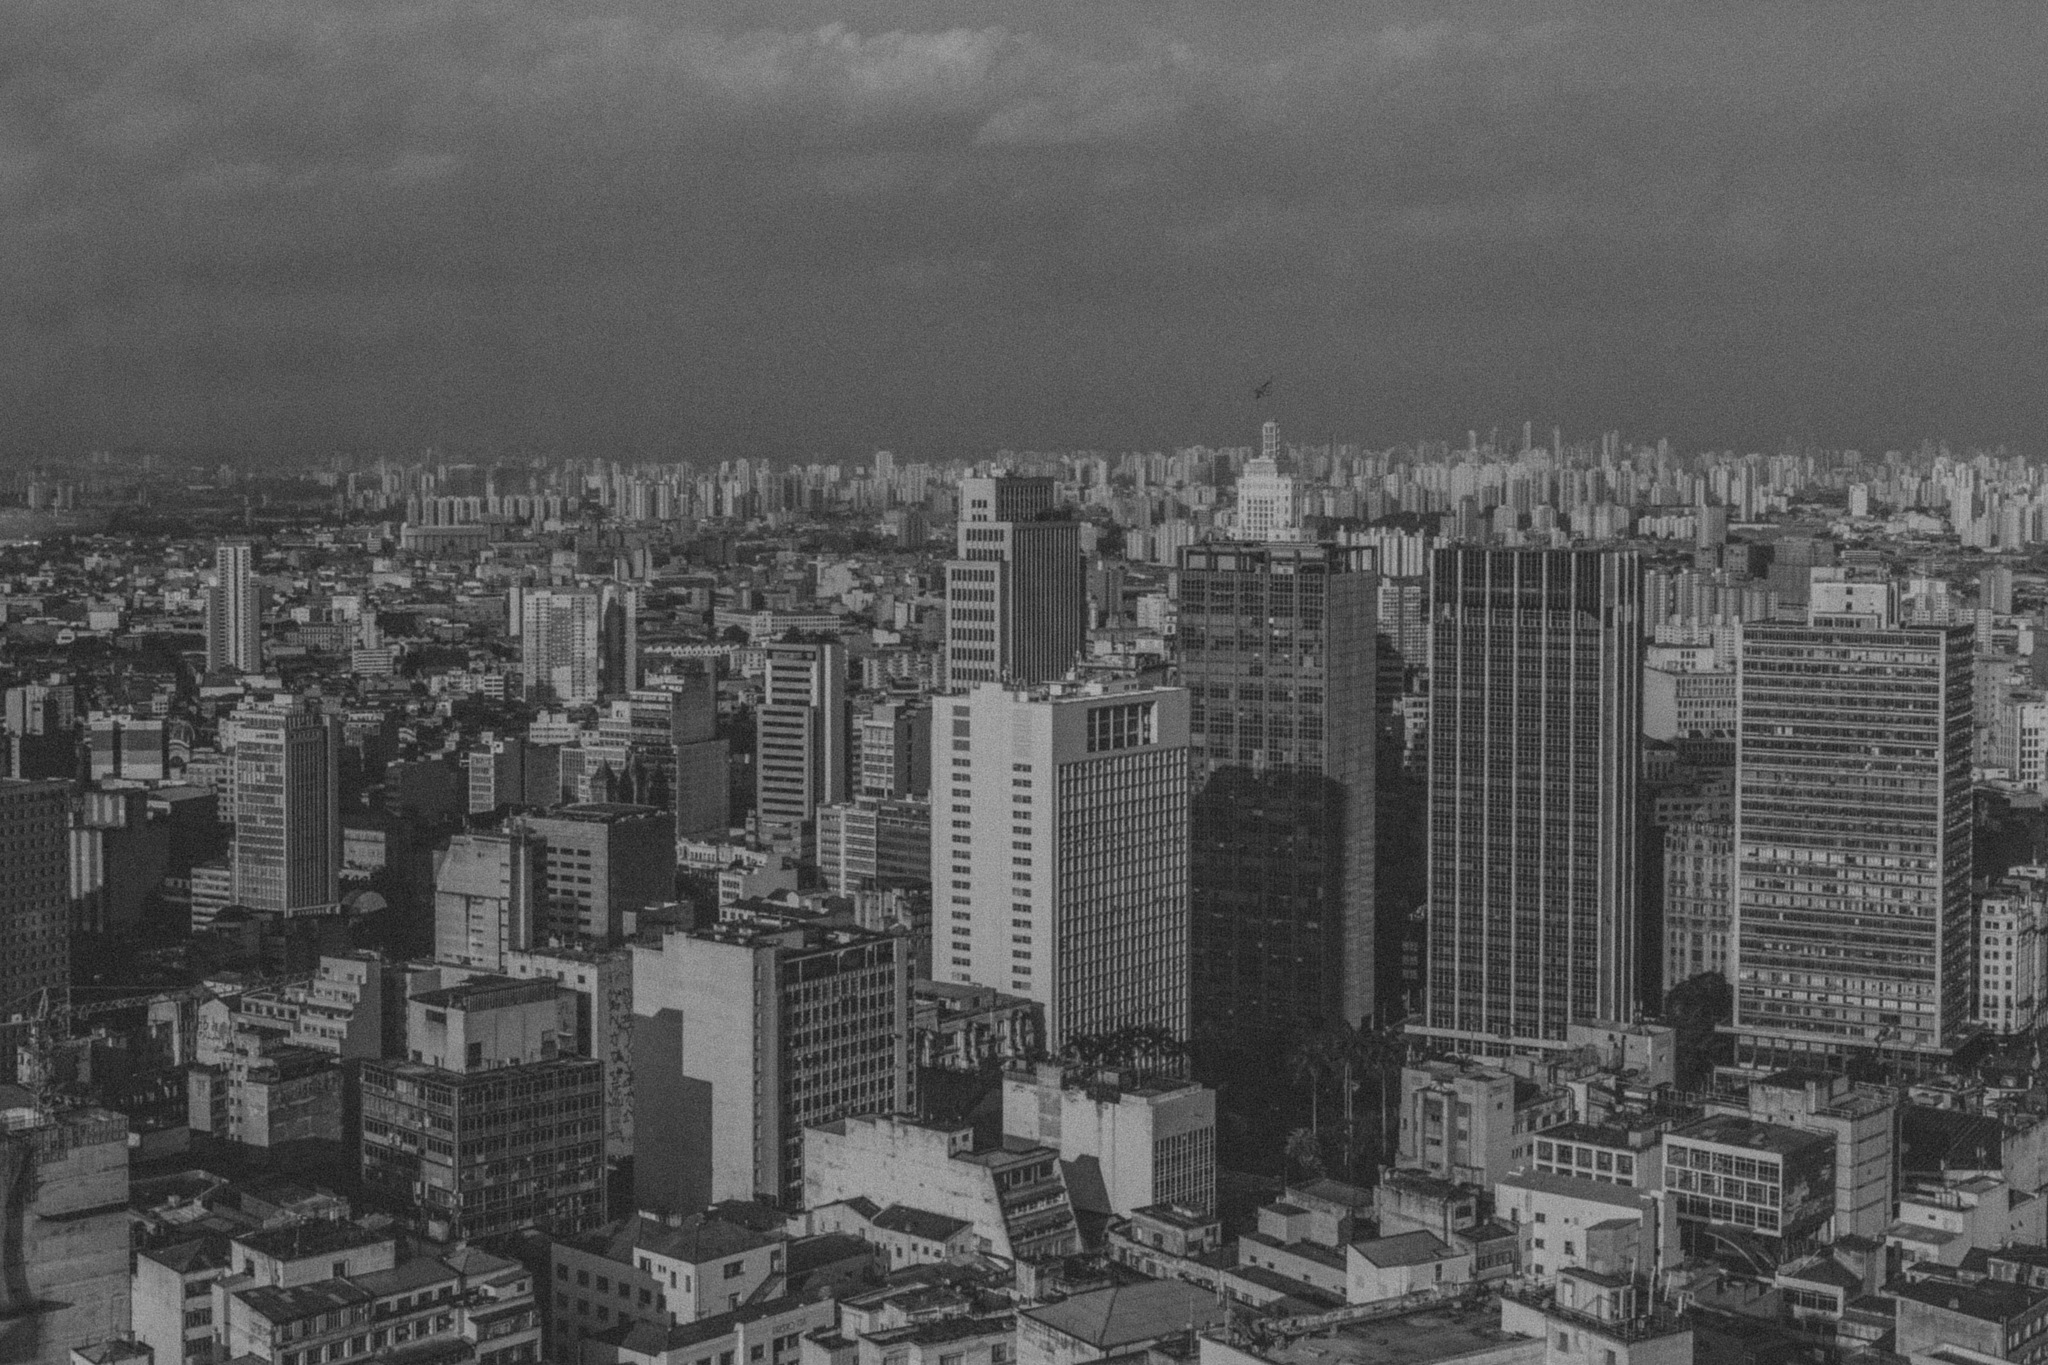 São Paulo  by Erick Ferreira